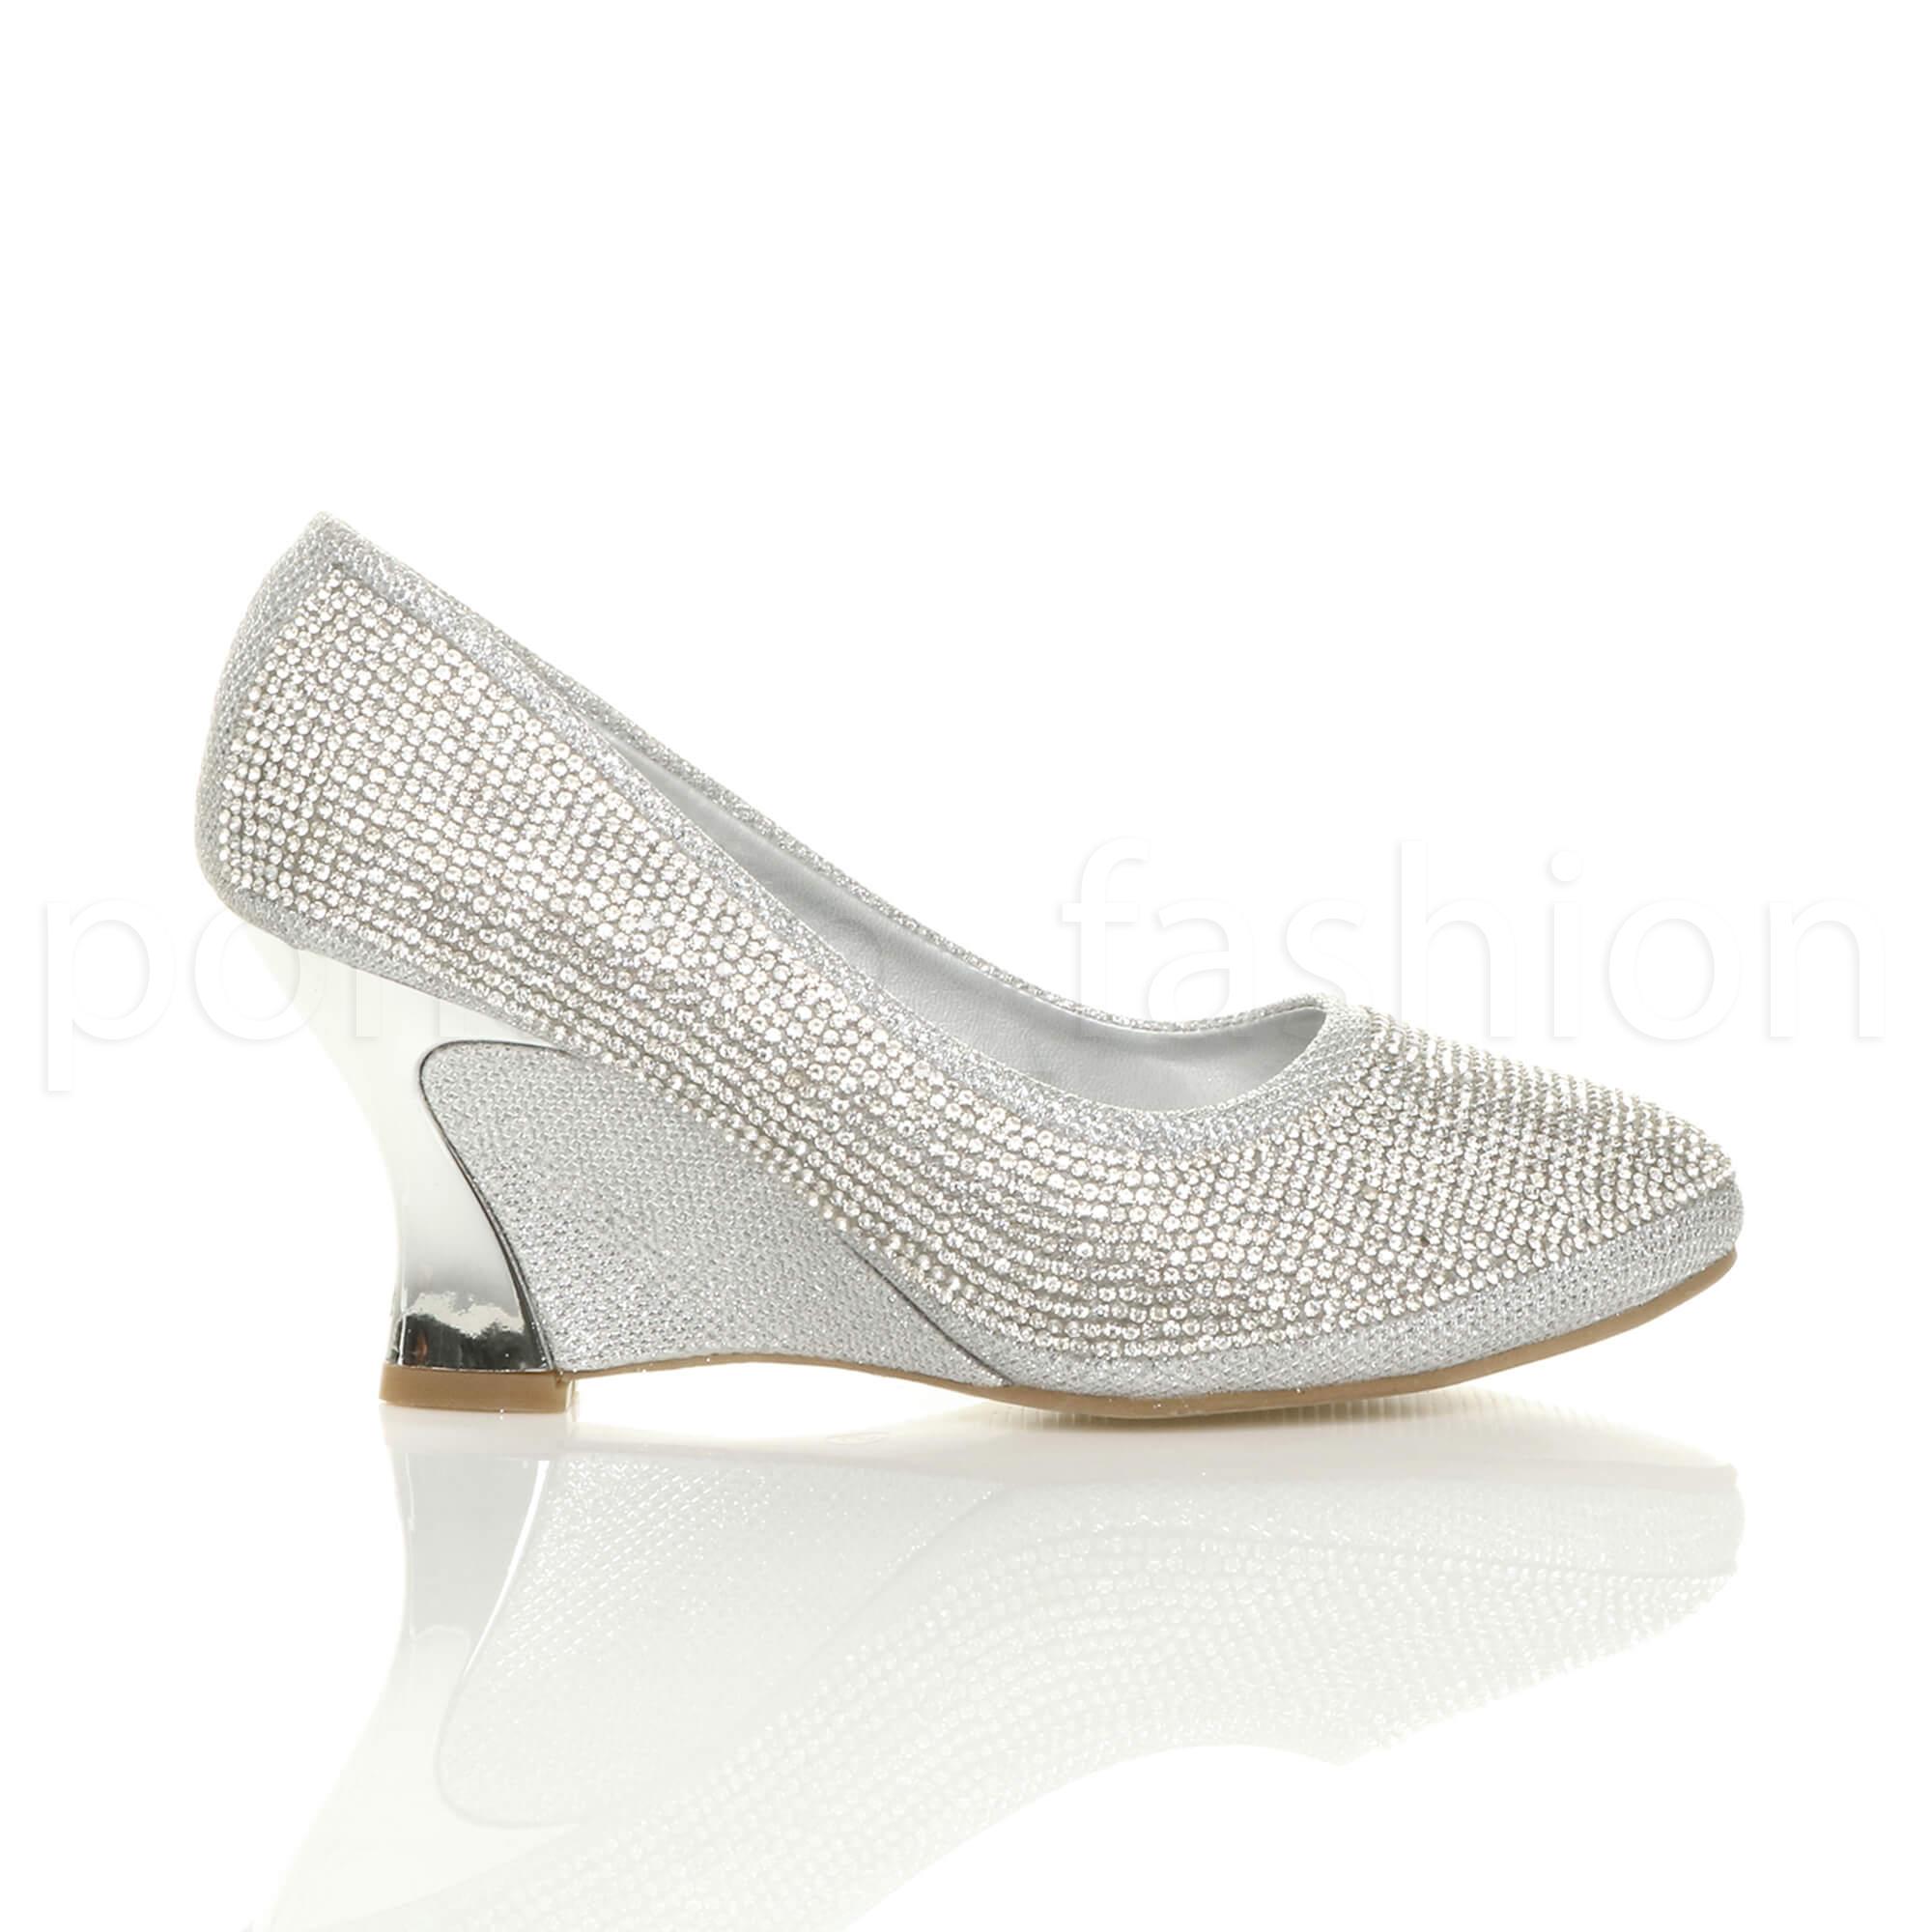 bdc80ad11e Womens Low Heel Wedge Diamante Evening Wedding Prom Bridal Court ...